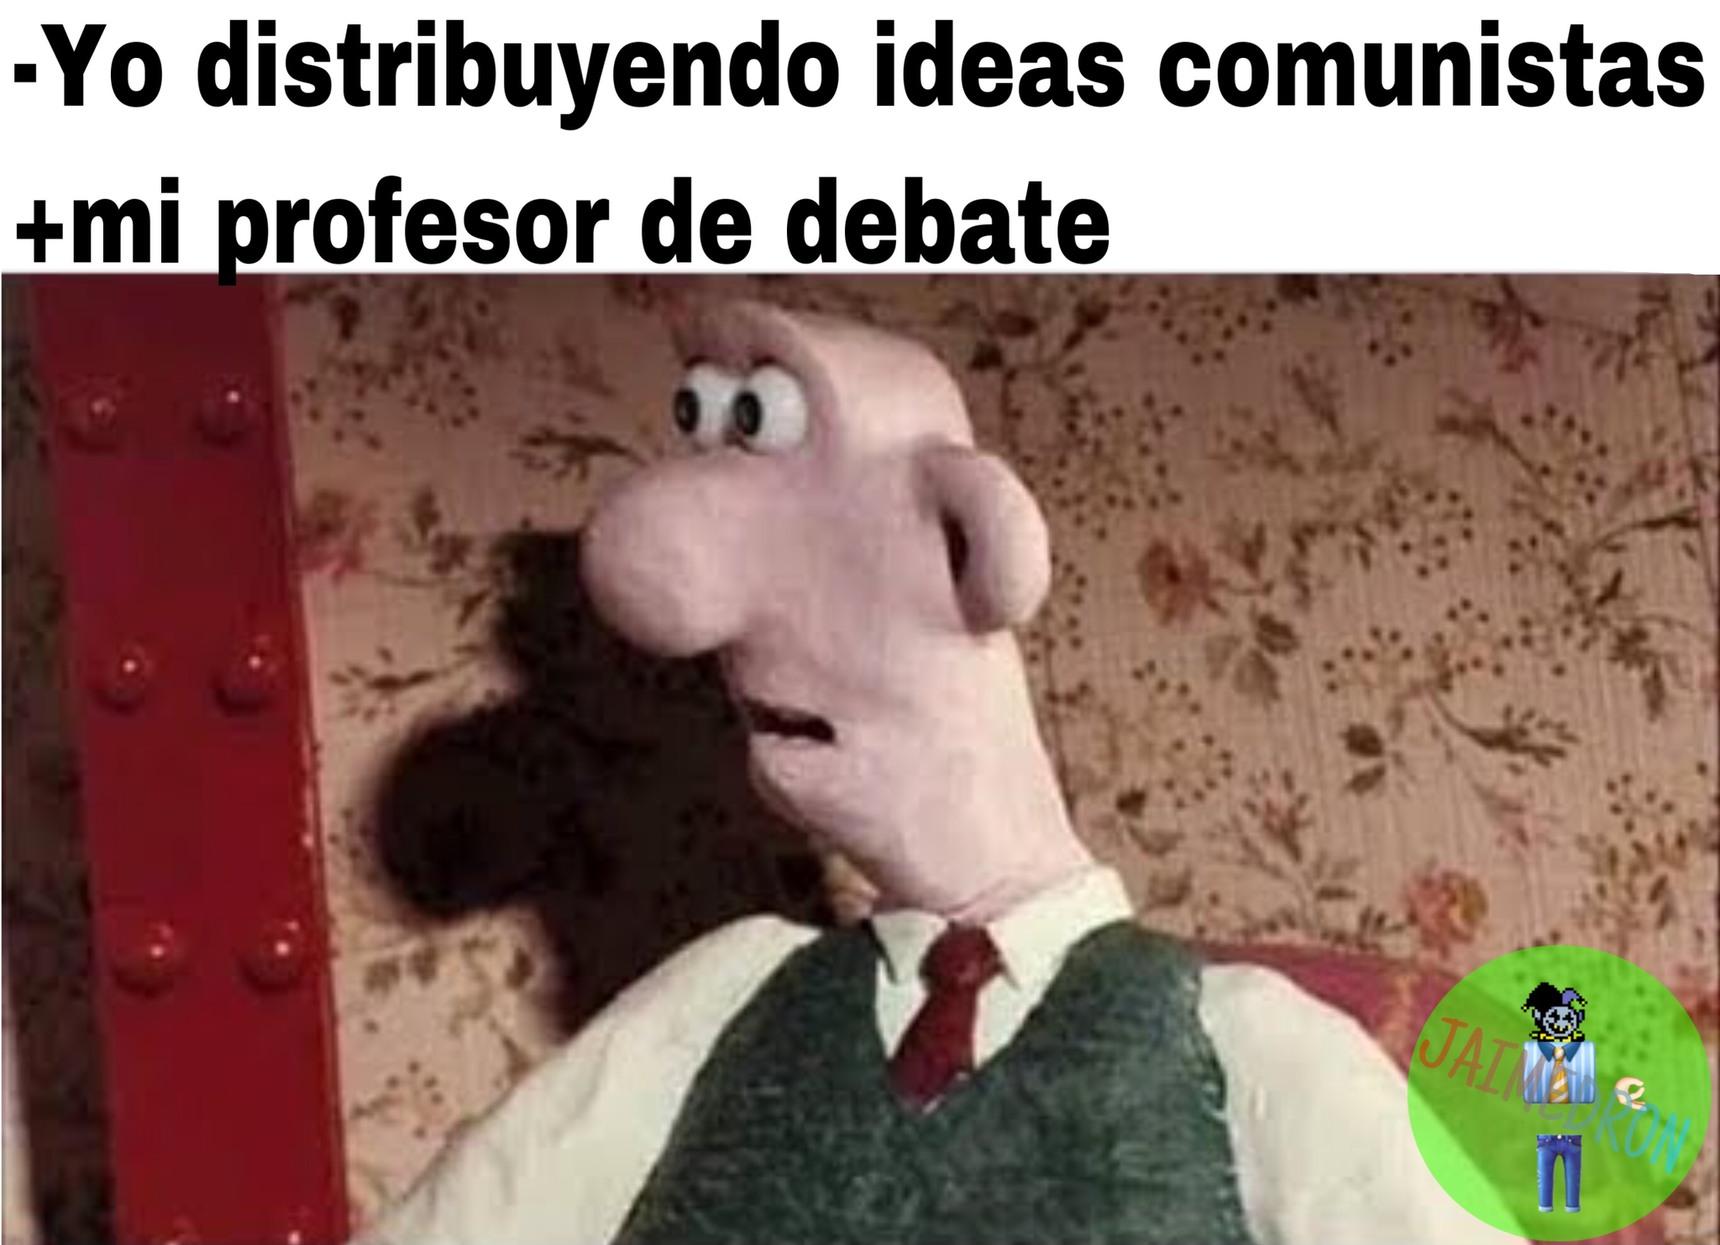 No al comunismo - meme